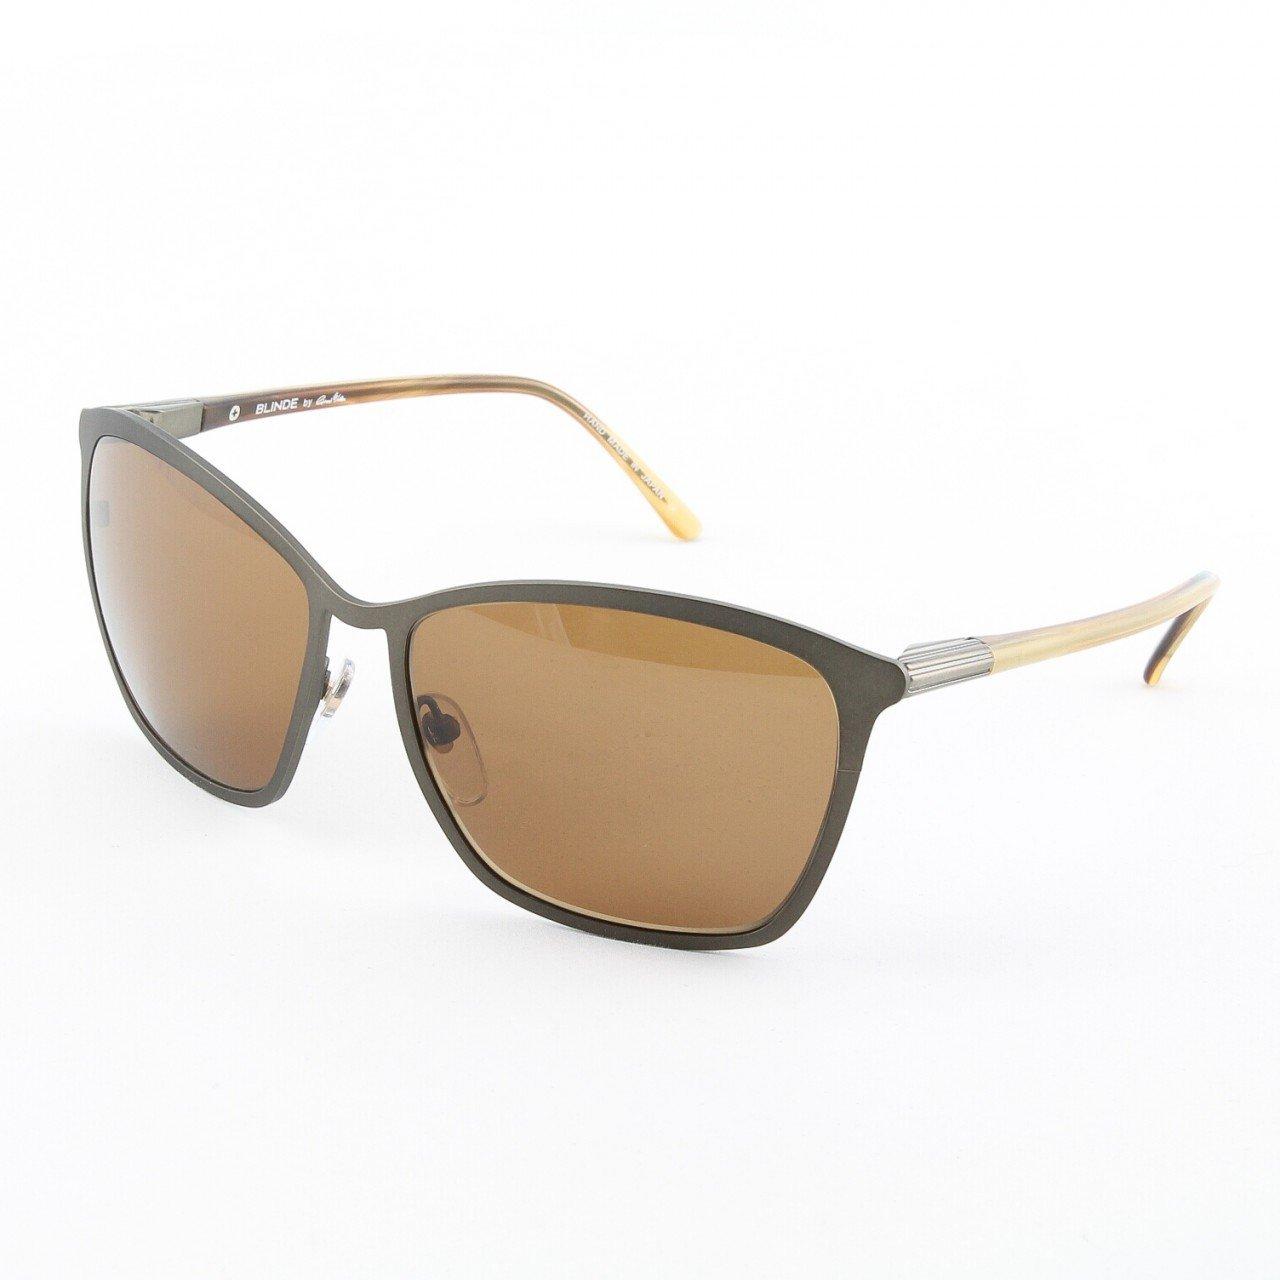 Blinde Ta Da Women's Cat Eye Sunglasses Col. Dark Brown with Brown Lenses